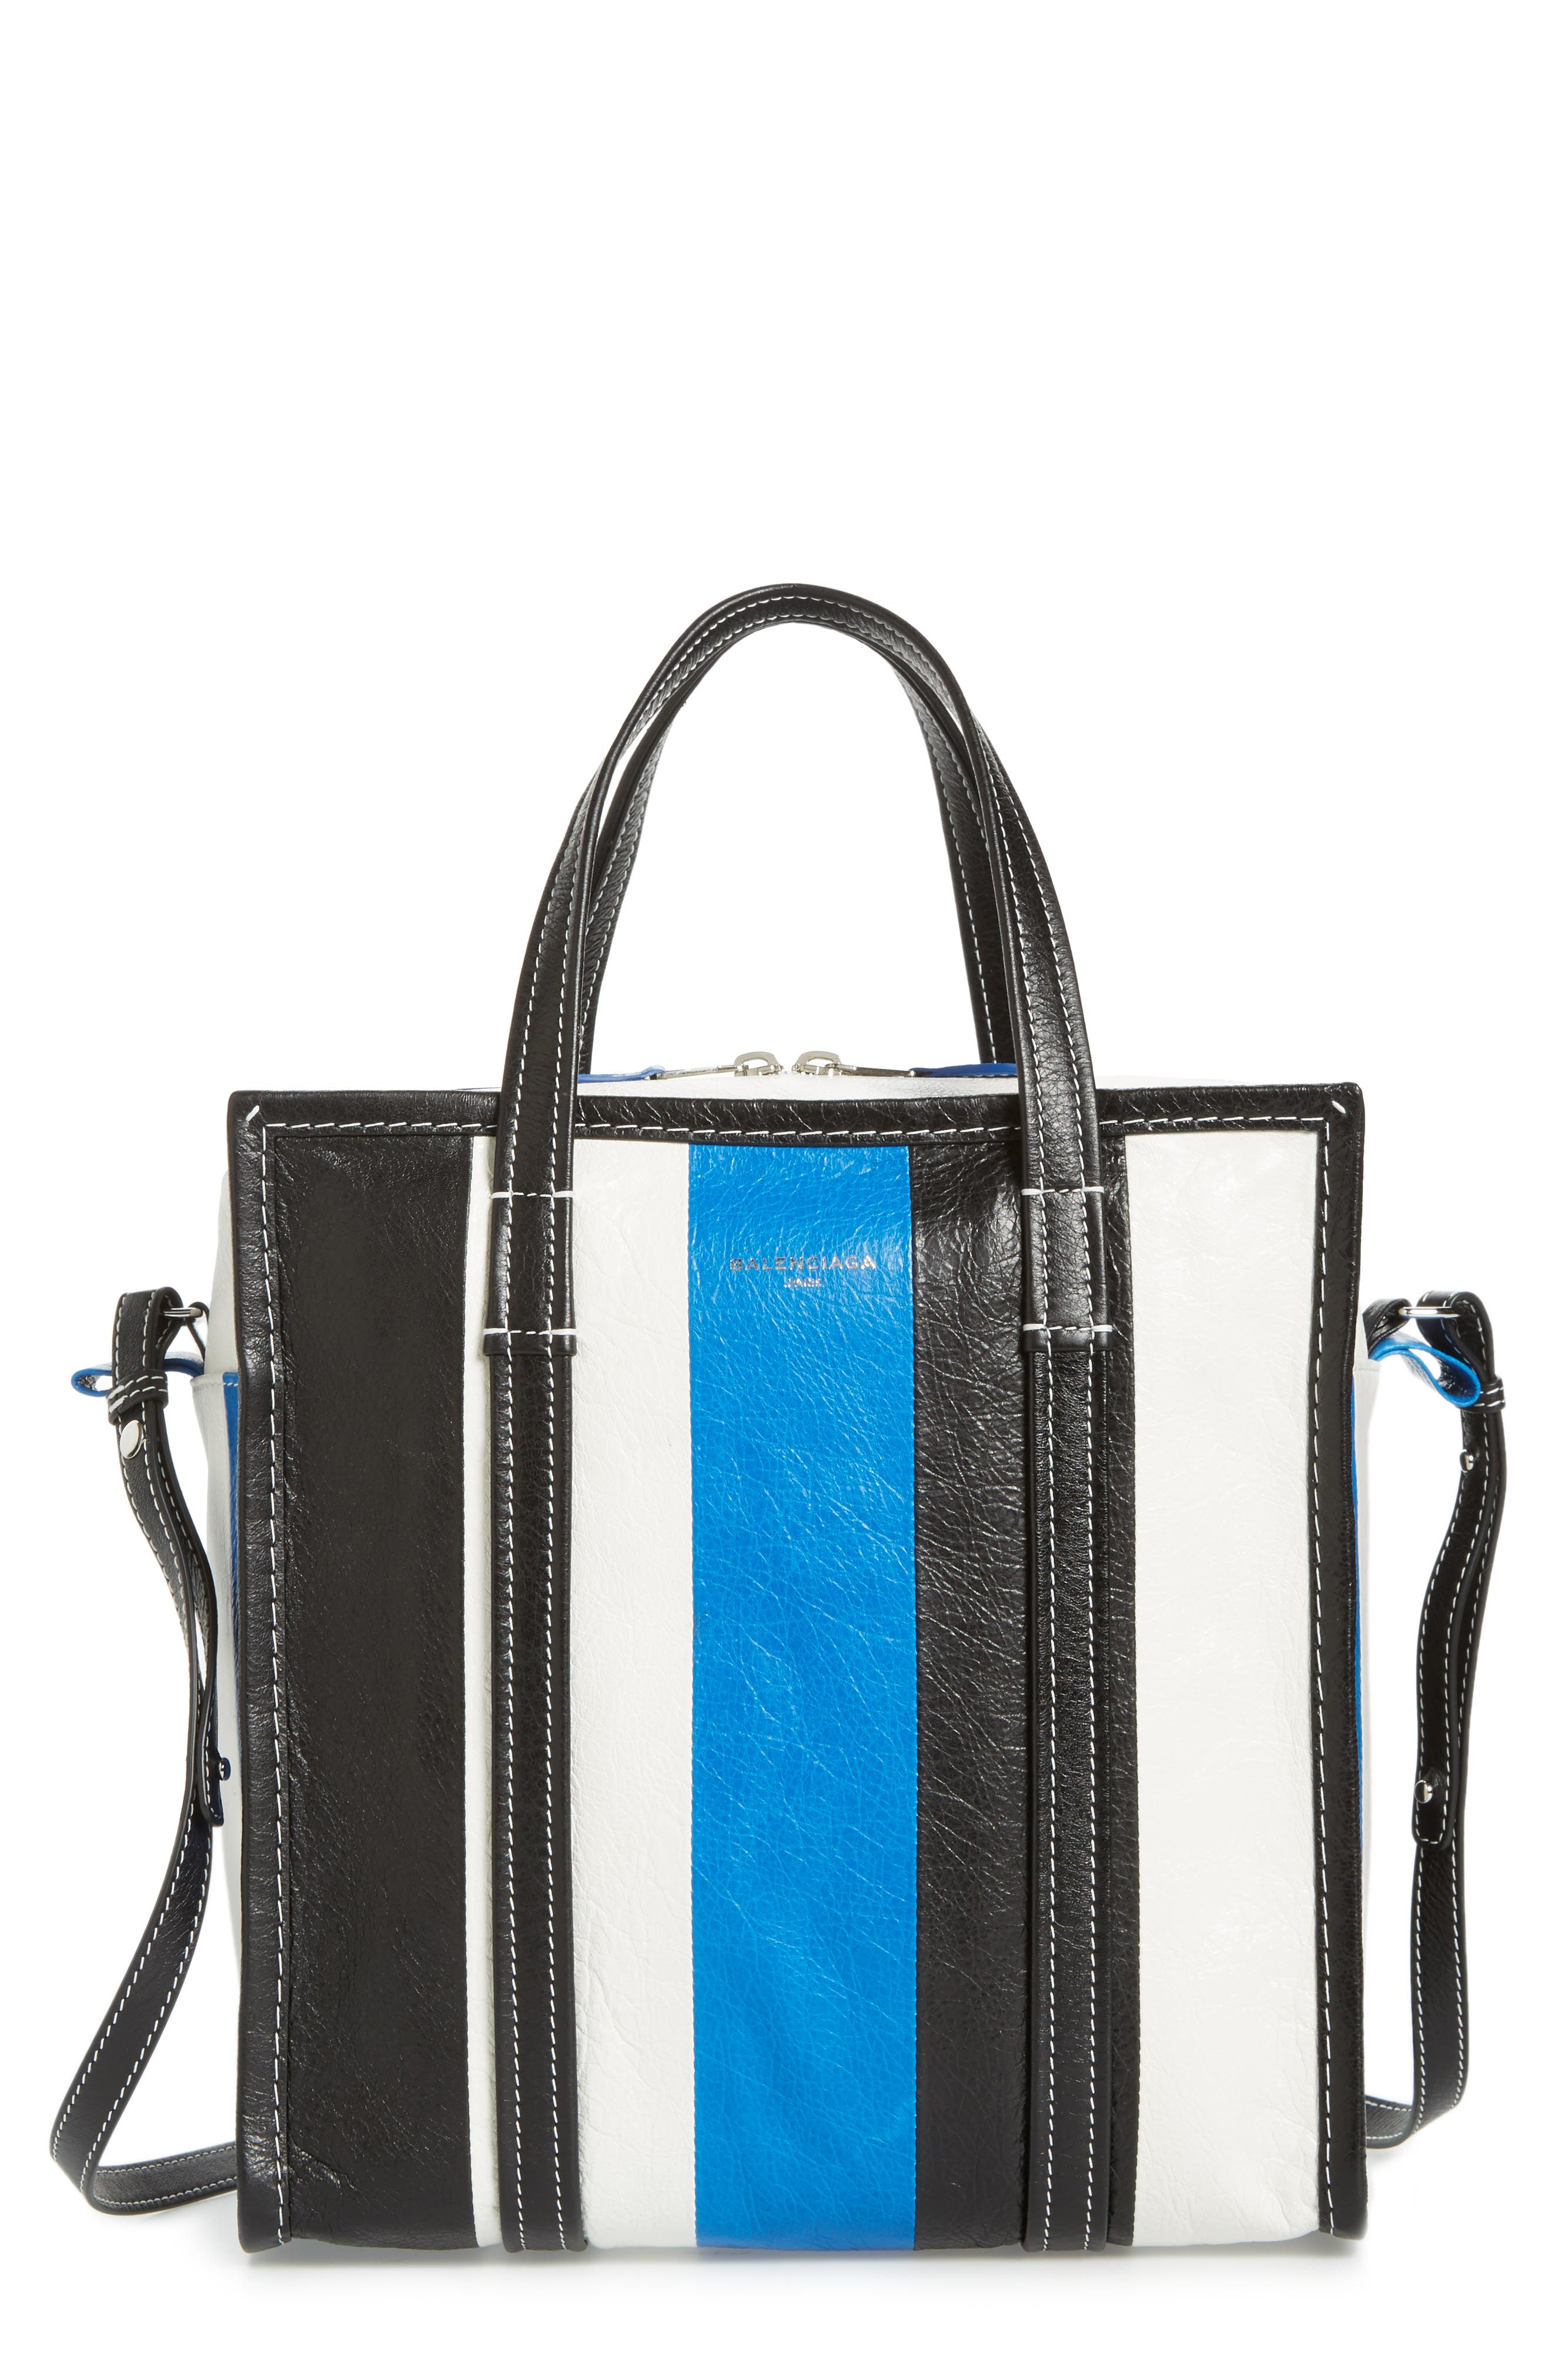 Balenciaga Handbags   Wallets for Women  b11085186358b